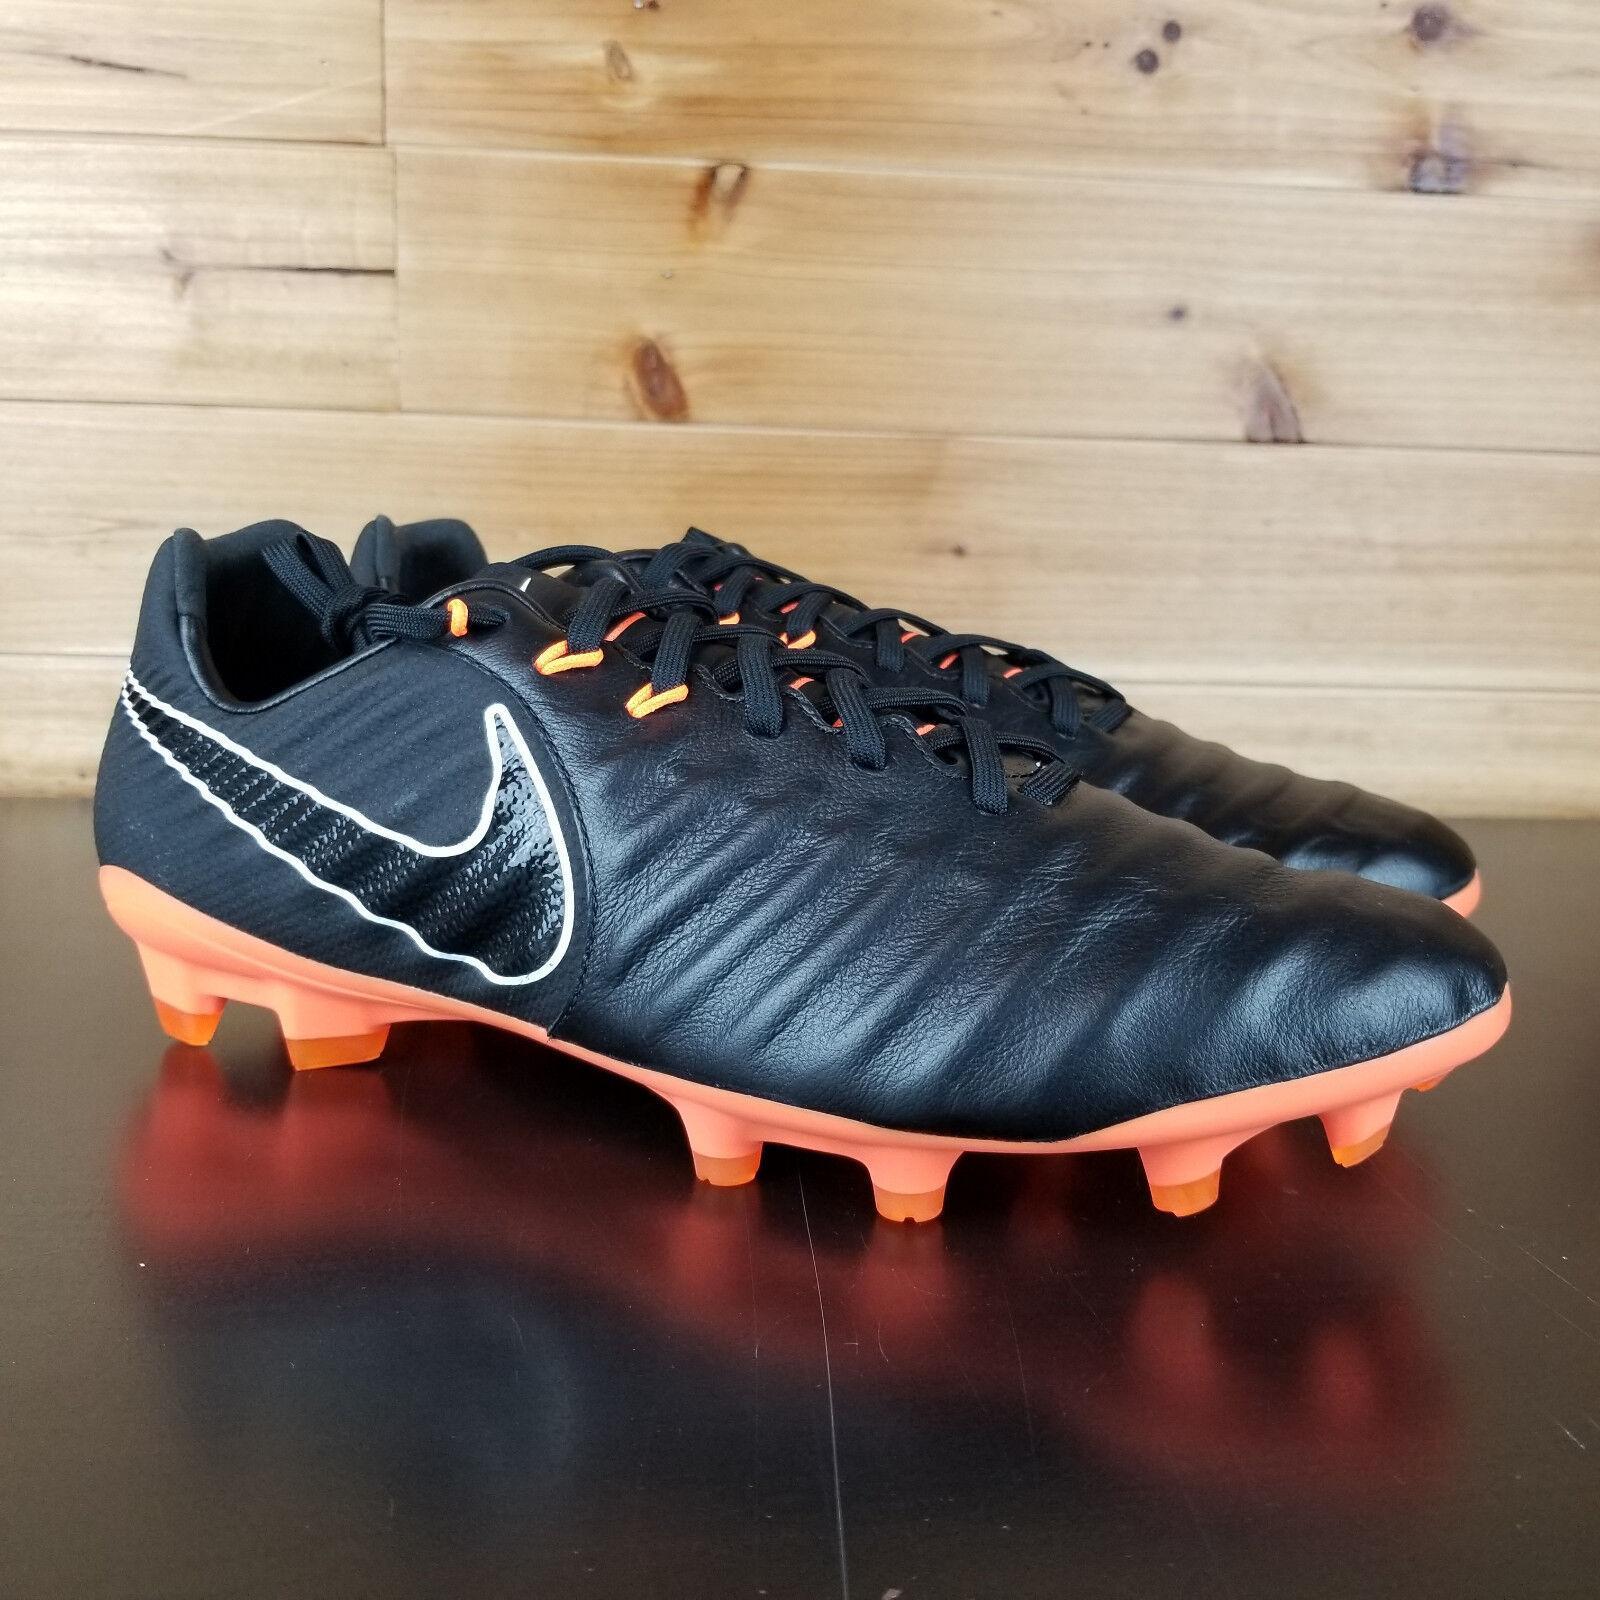 Nike Tiempo Legend VII 7 Pro FG Leather Soccer Cleats Black Orange AH7241-080 NB